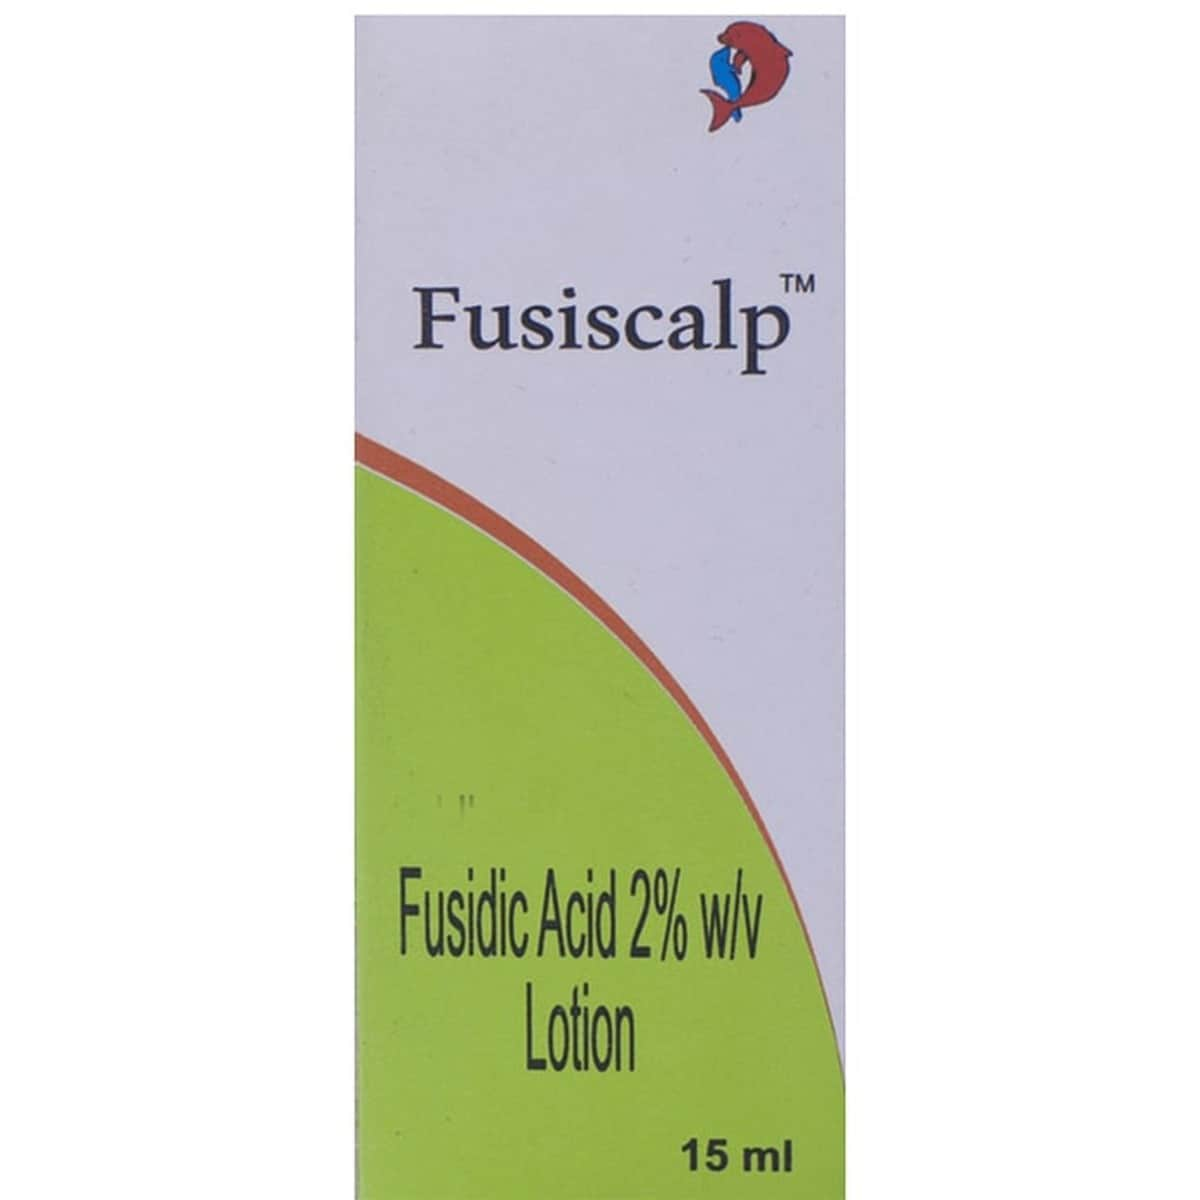 Fusiscalp Lotion 15 ml